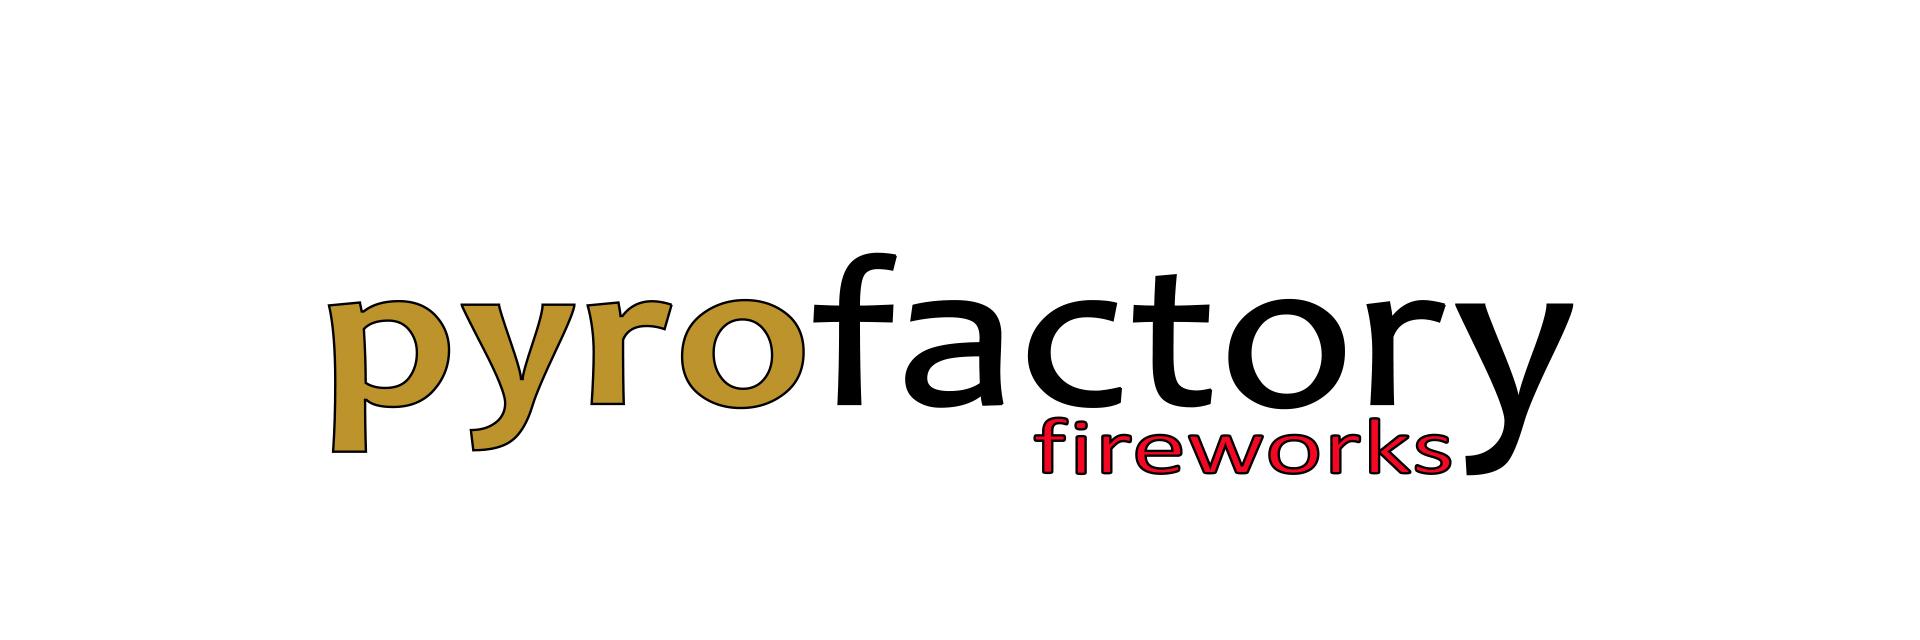 Pyrofactory Fireworks